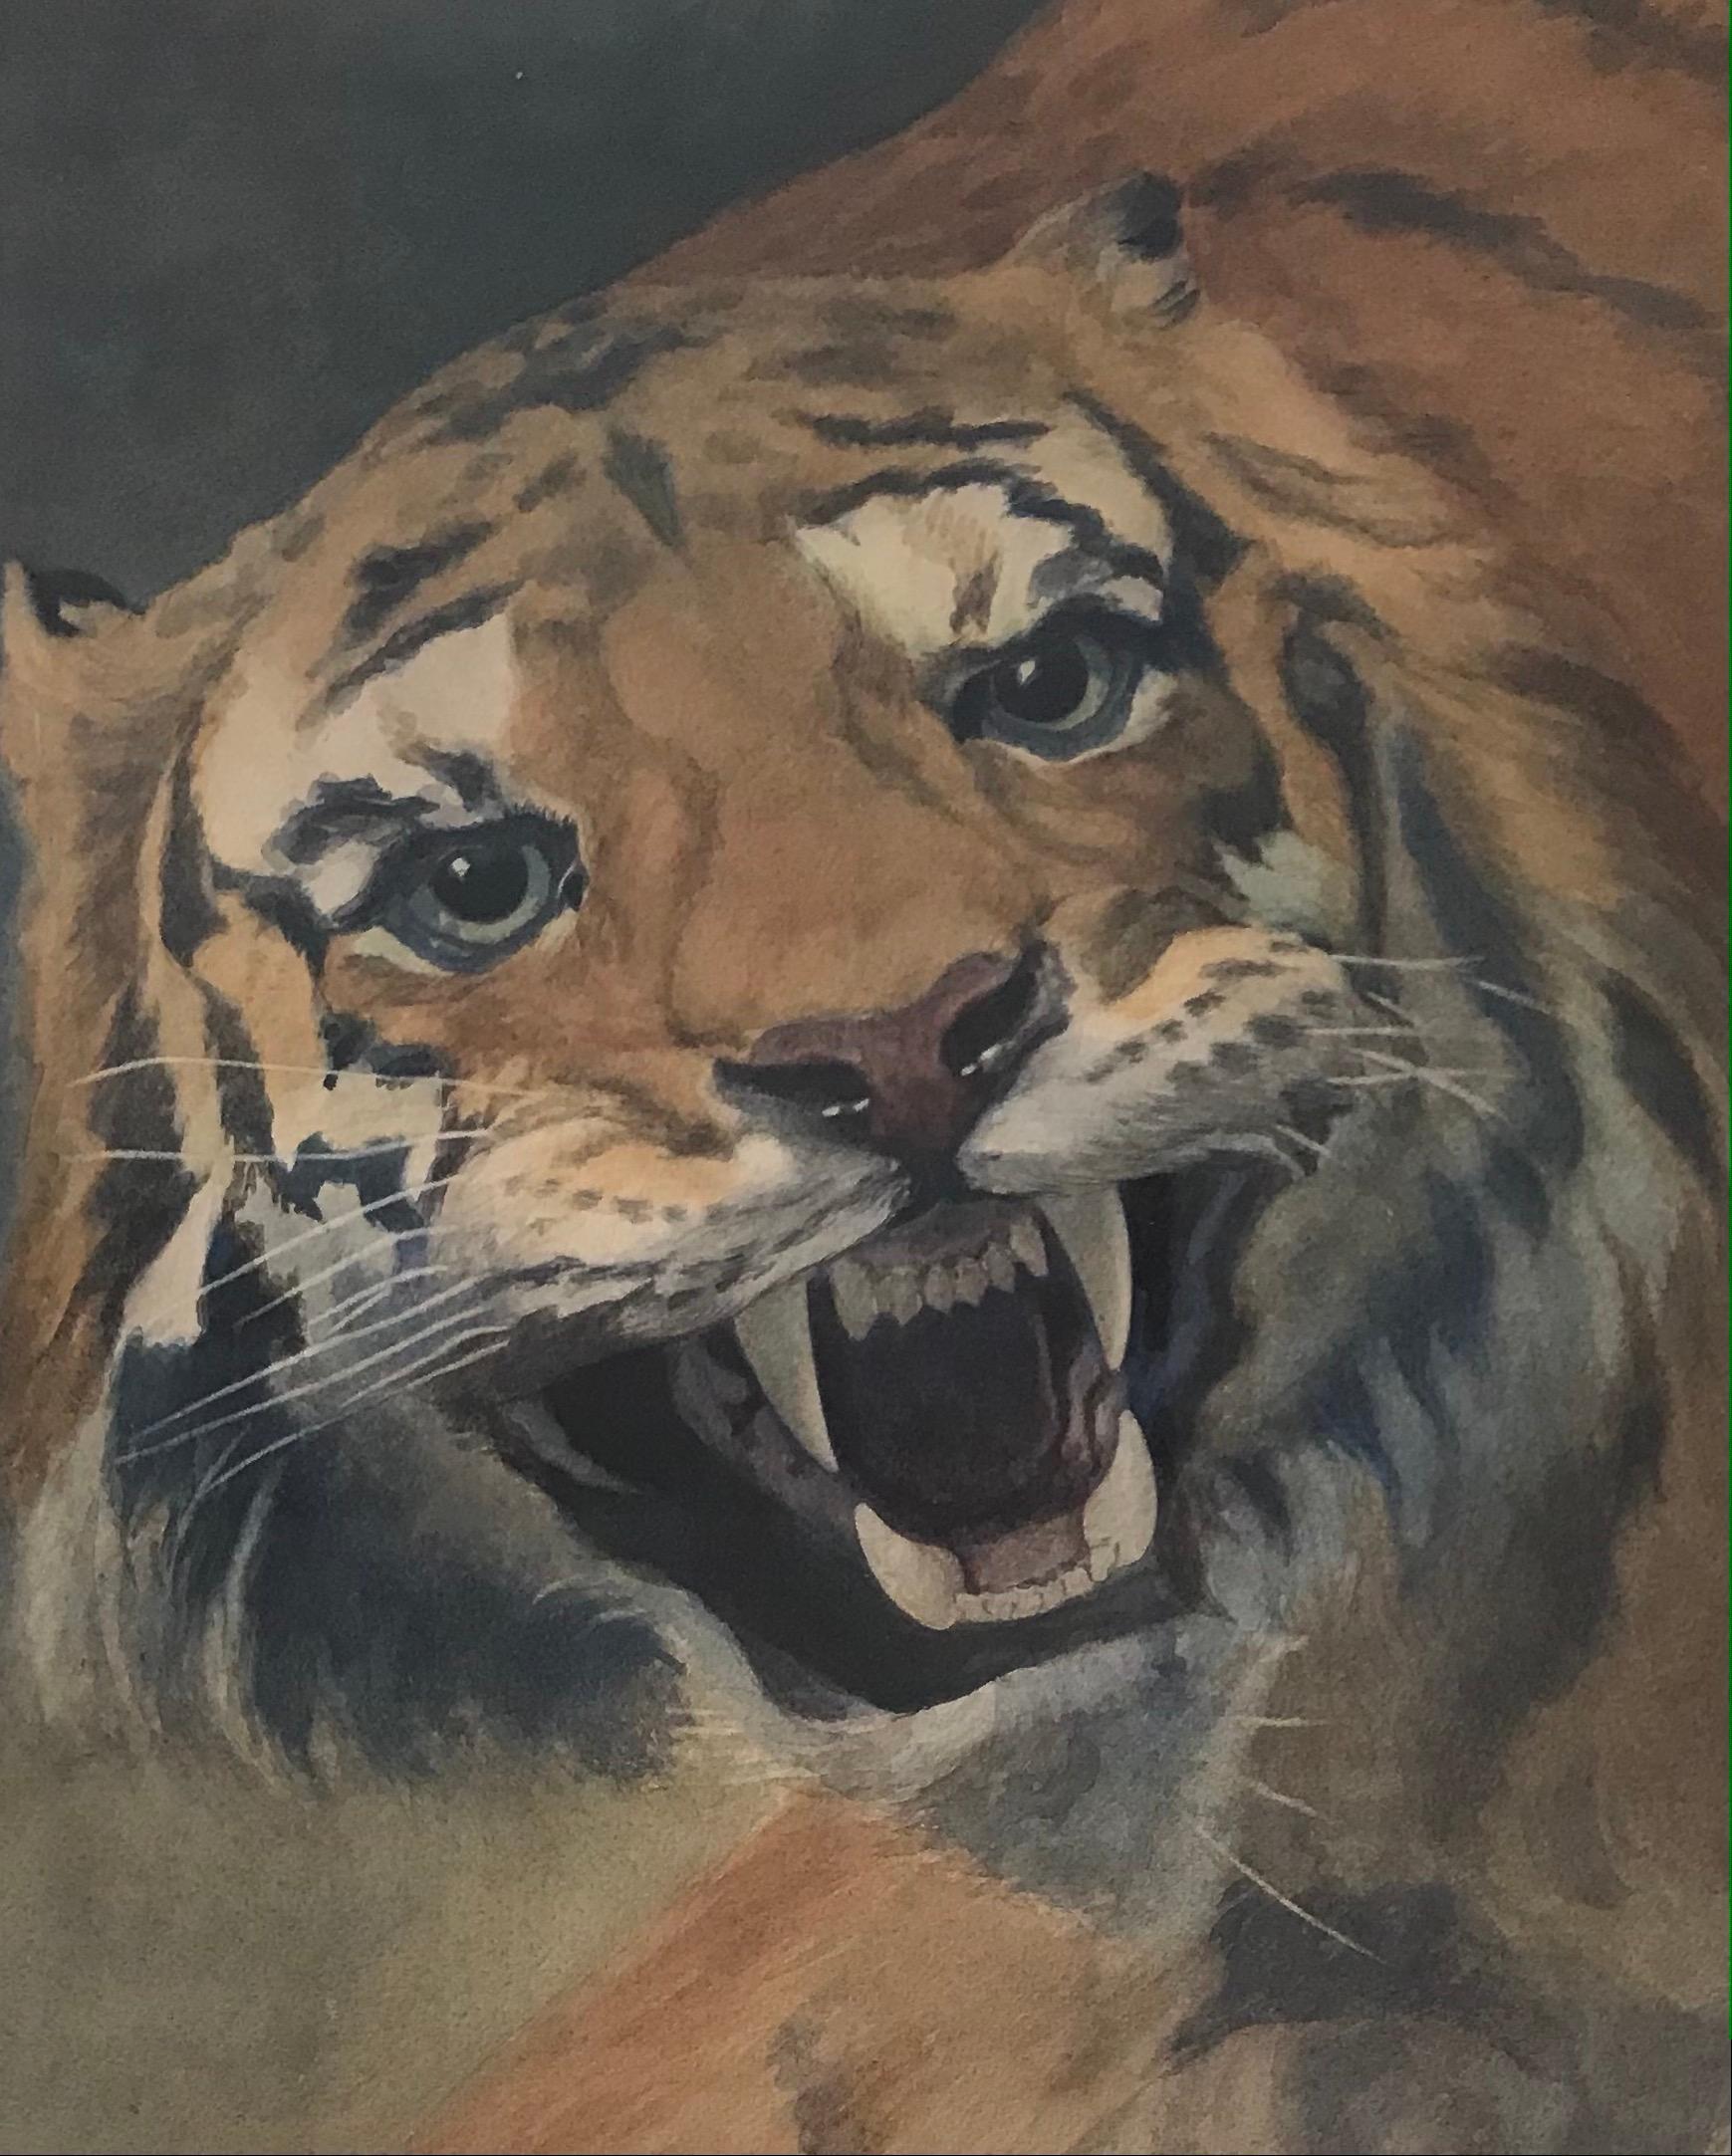 James Exley, Roaring Tiger watercolour